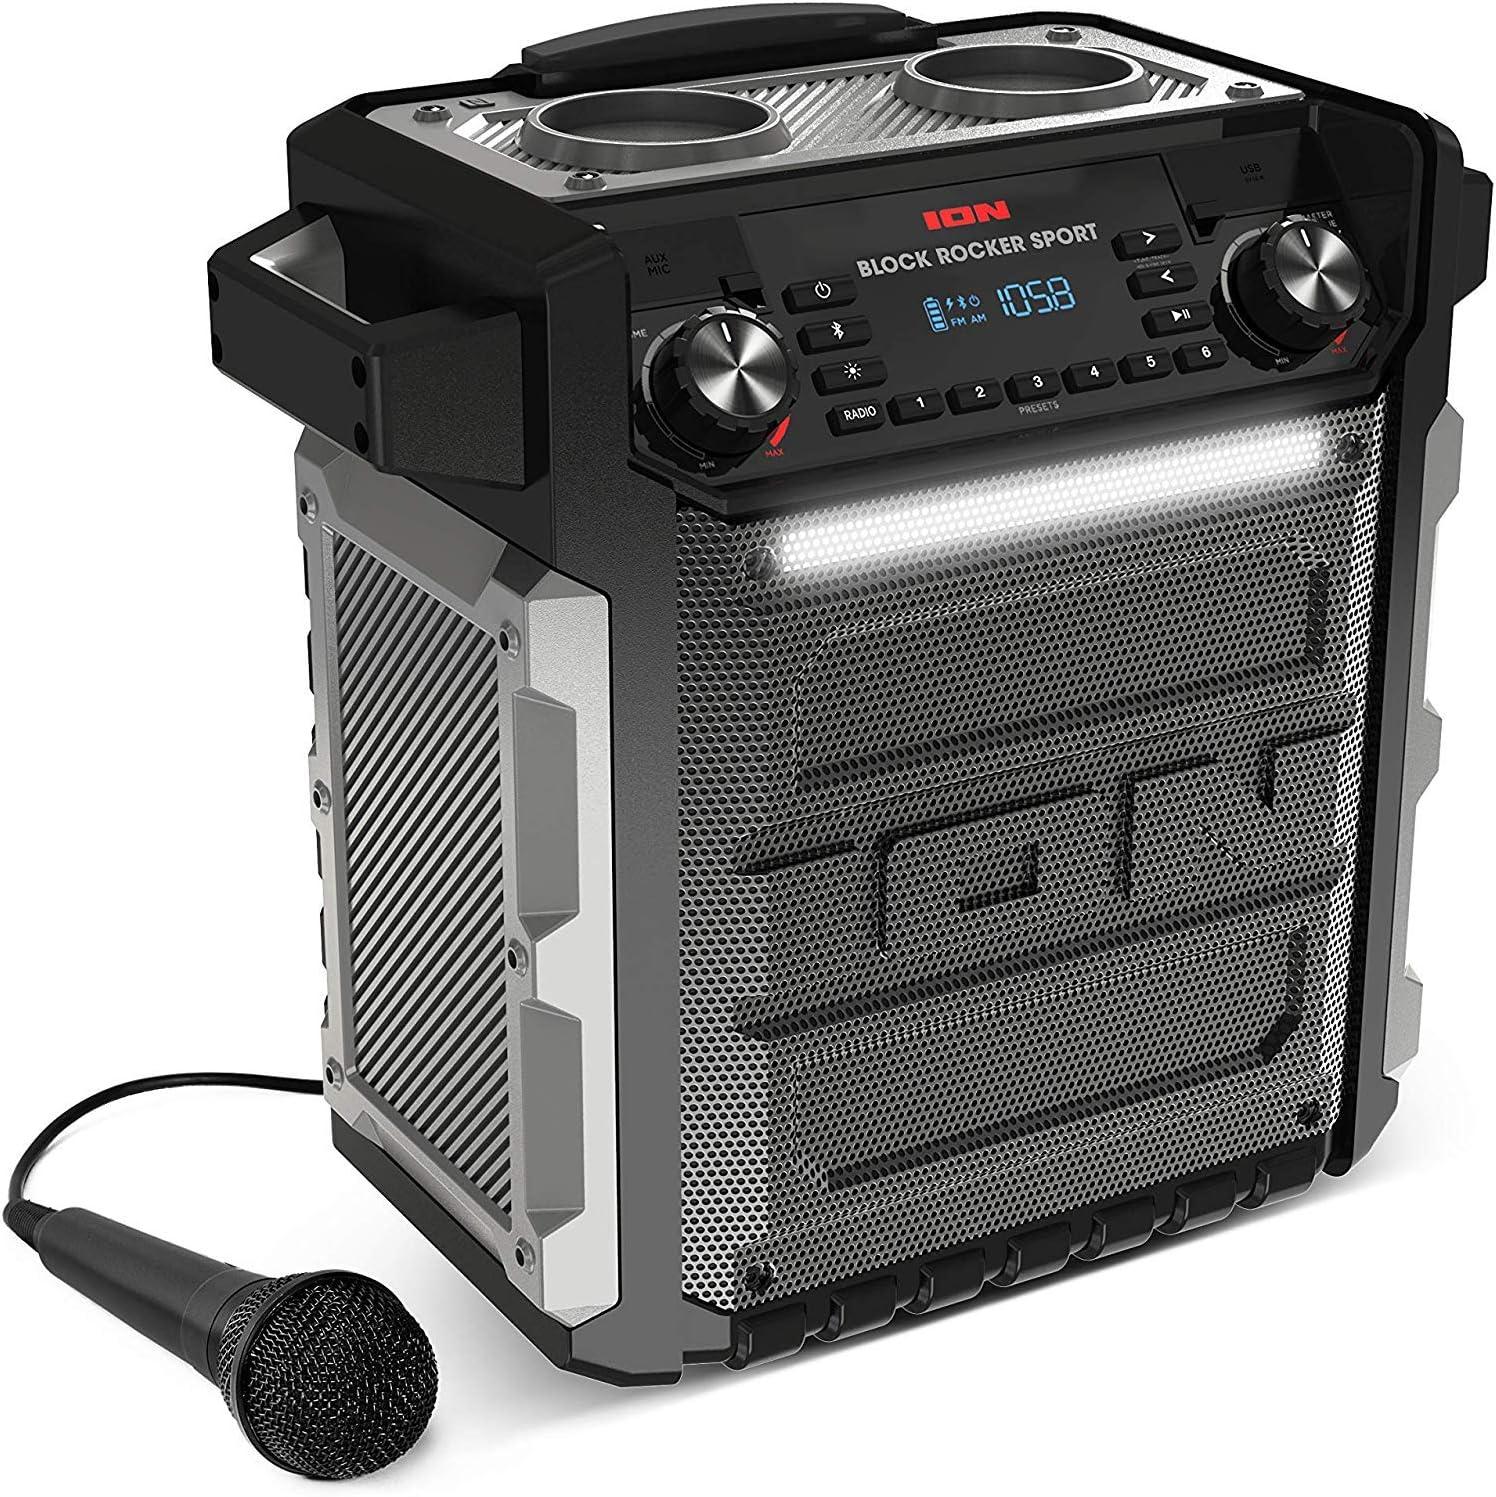 ION Audio Block Rocker Sport - Altavoz Impermeable Ultra-Portátil de 100 Vatios con Batería Recargable de Larga Duración, Bluetooth, Micrófono, Radio Am/FM, Barra de Luces y Entrada Auxiliar